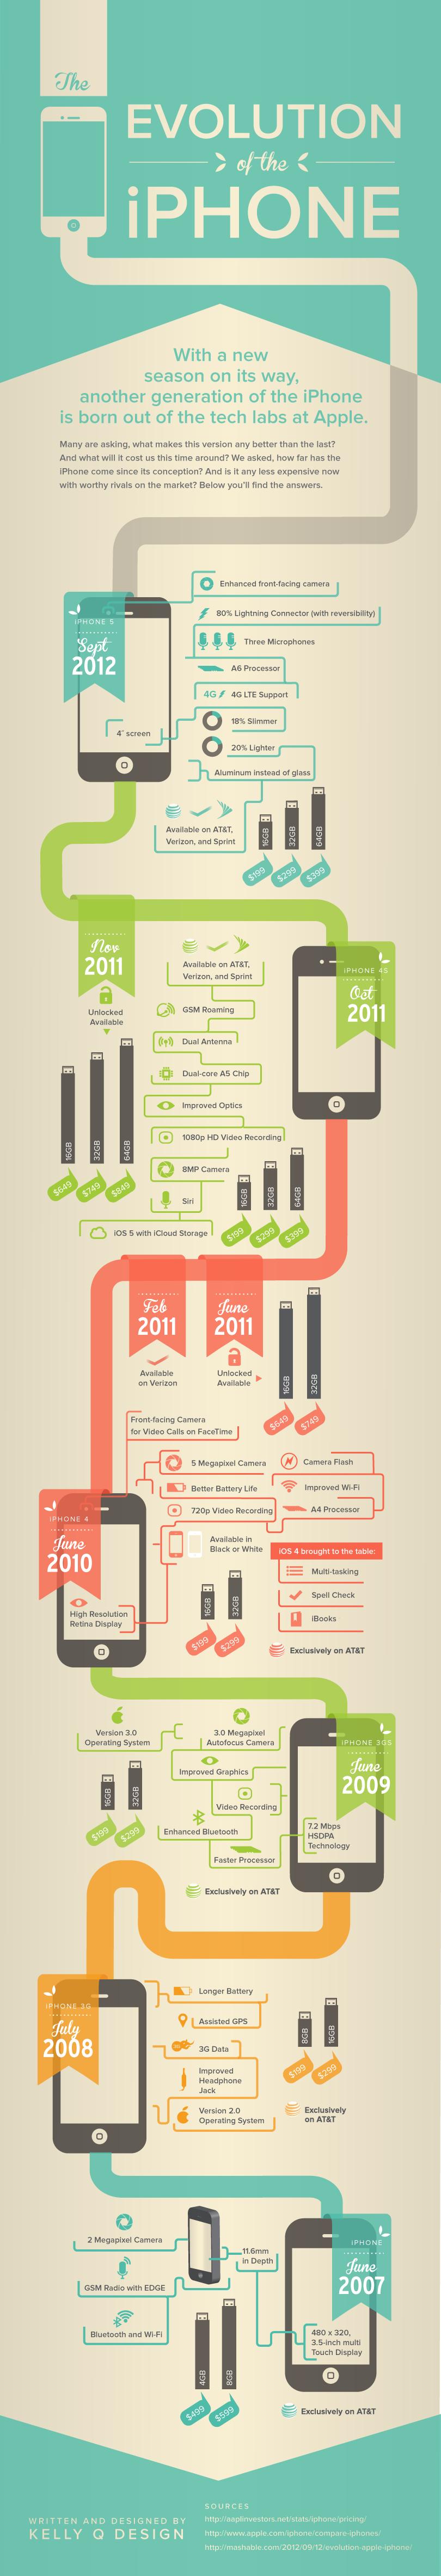 iphone-evolution-timeline-specs-infographic